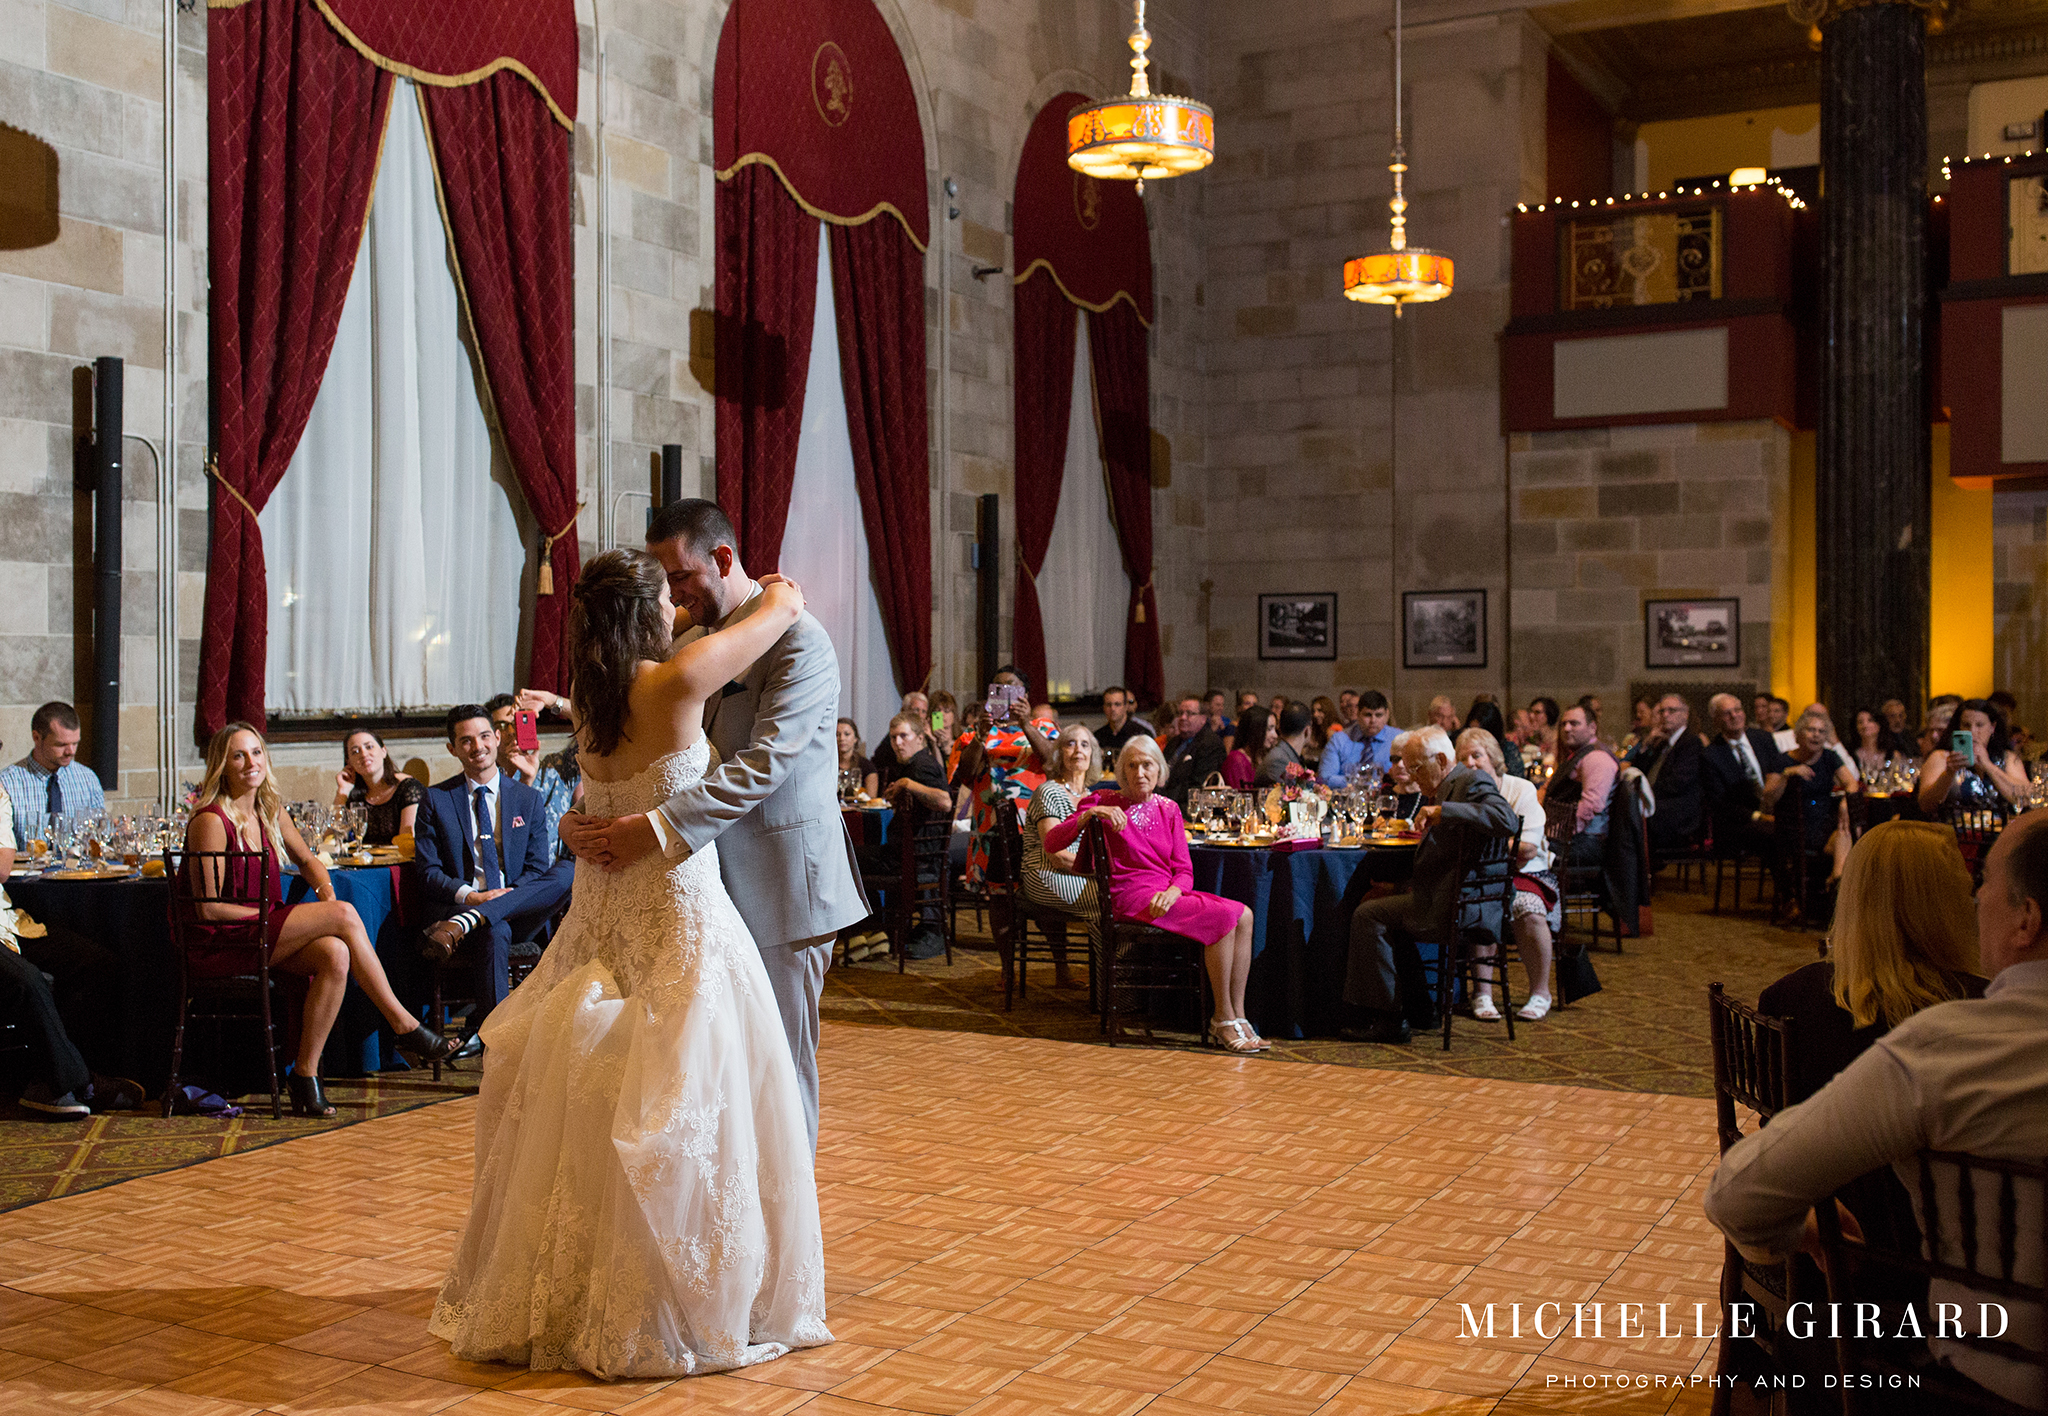 Hartford CT Wedding At The Society Room City Hall Portraits Sneak Peek Danielle And Patrick